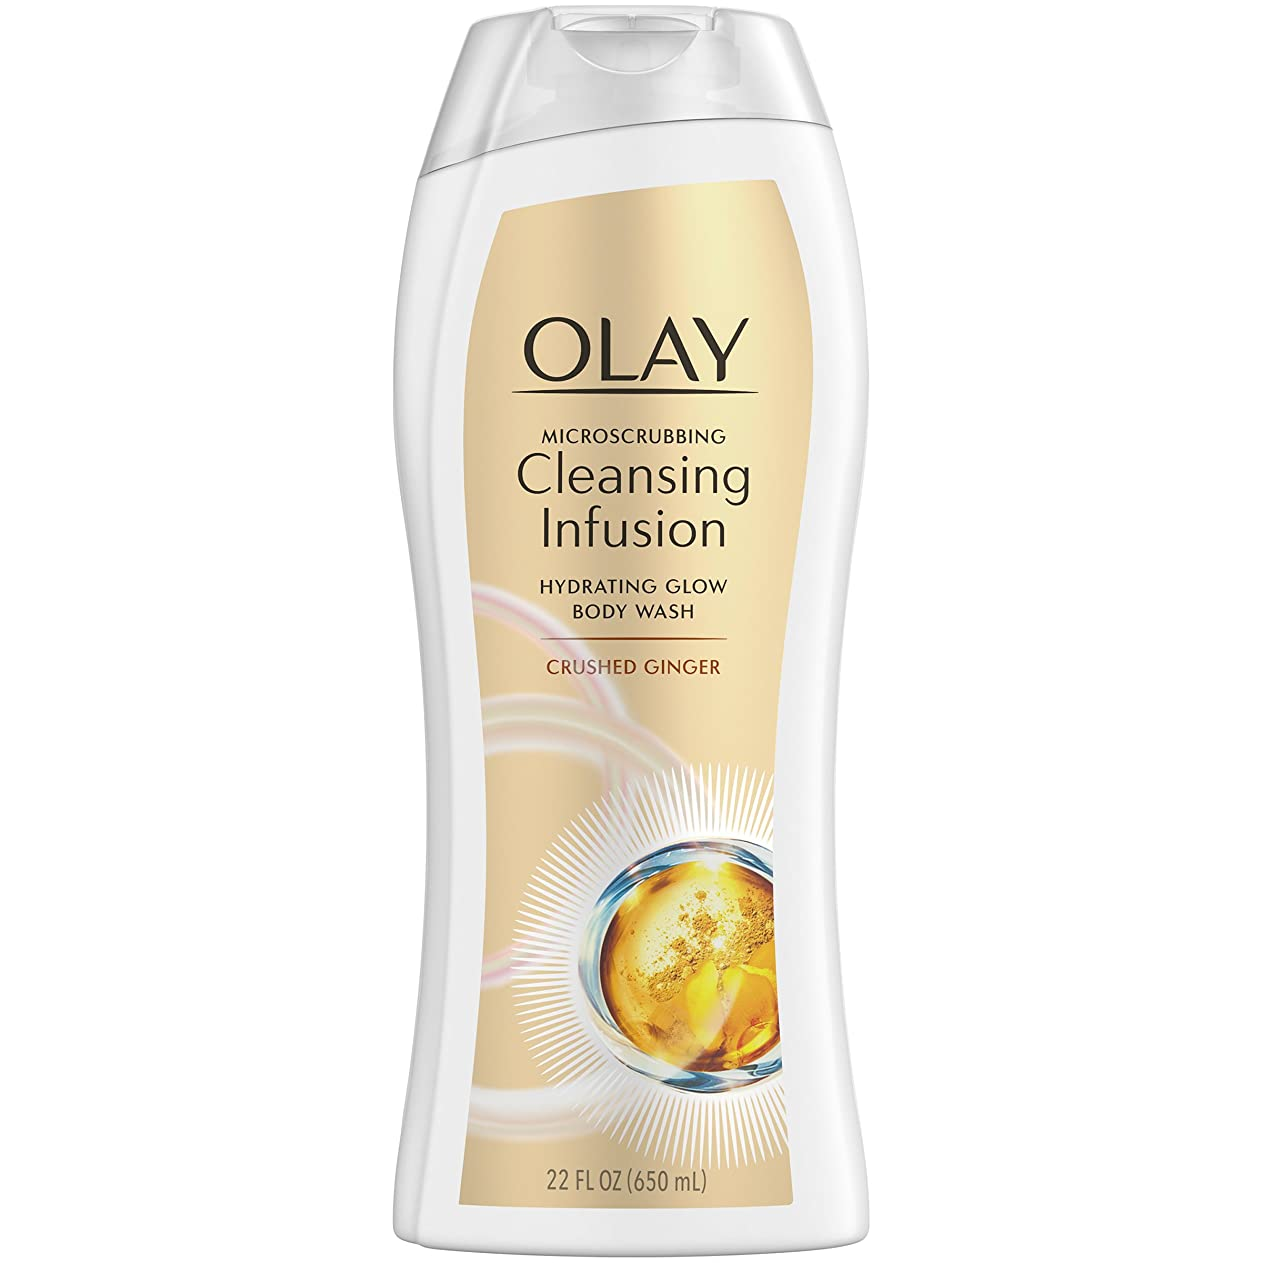 Olay Microscrubbingクレンジング注入ボディウォッシュ、砕石ジンジャー、22オンス